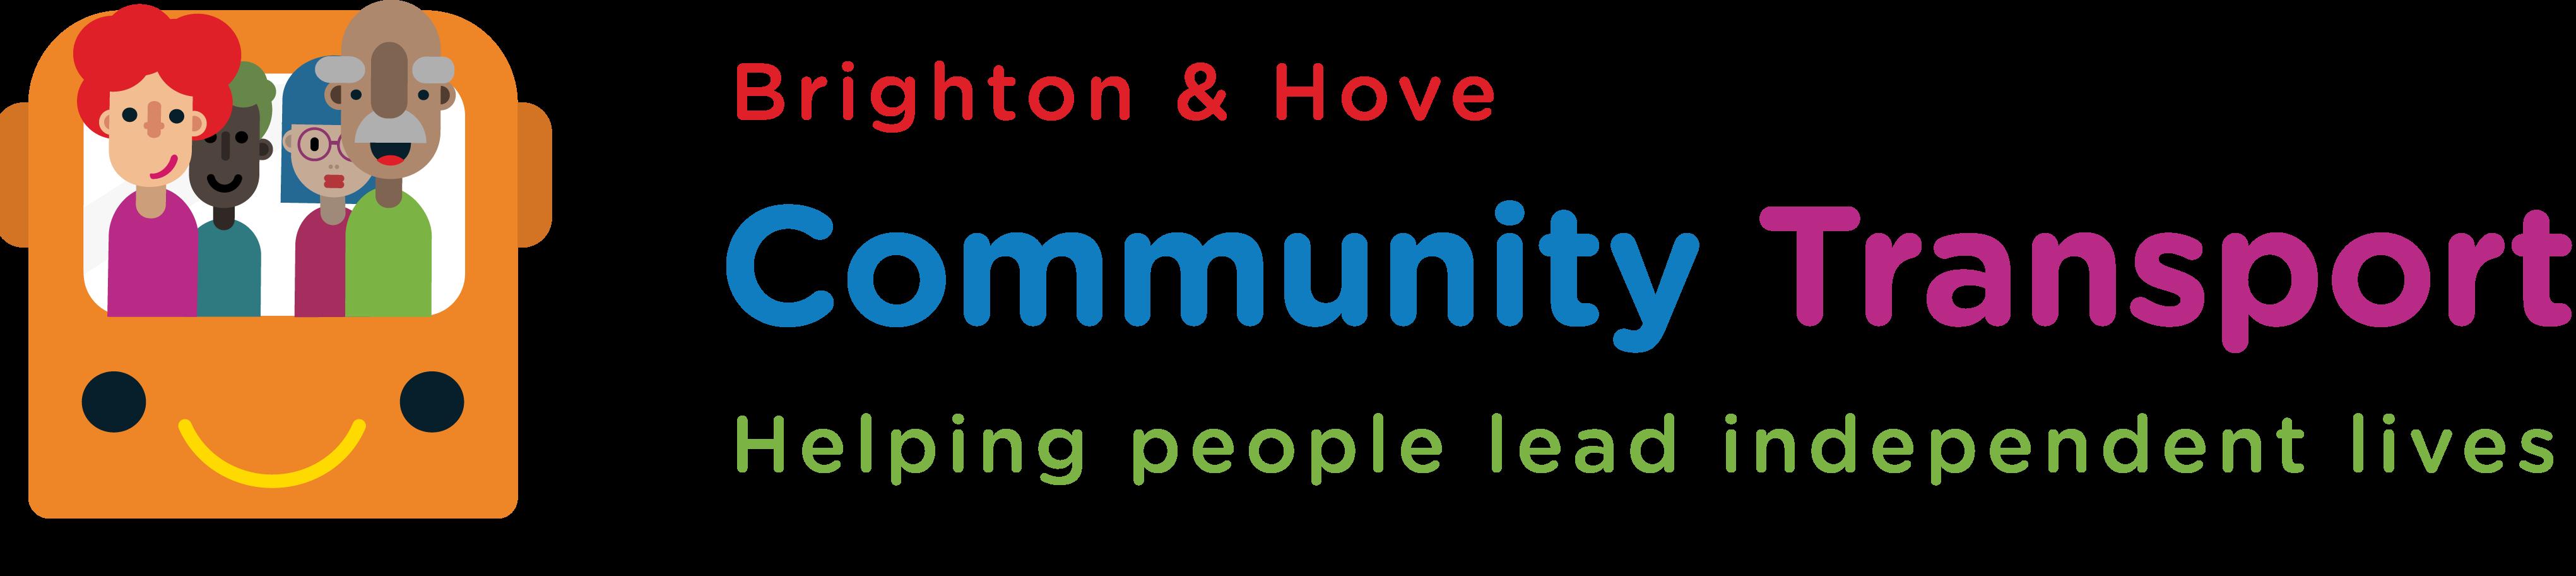 Brighton & Hove Community Transport